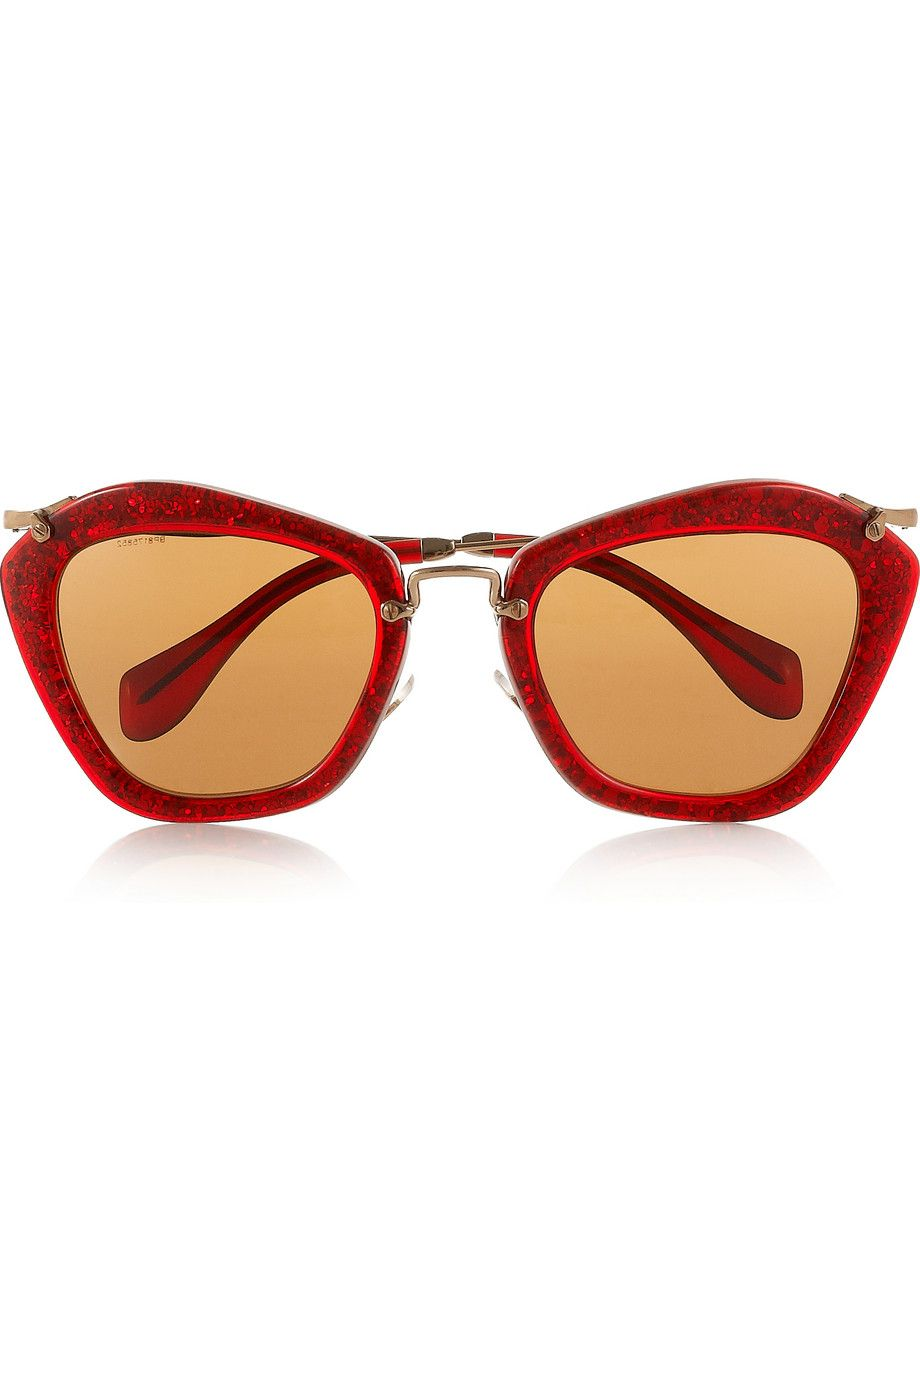 Miu Miu cat eye red glitter sunglasses. I will forever want these ... 79b4166892322